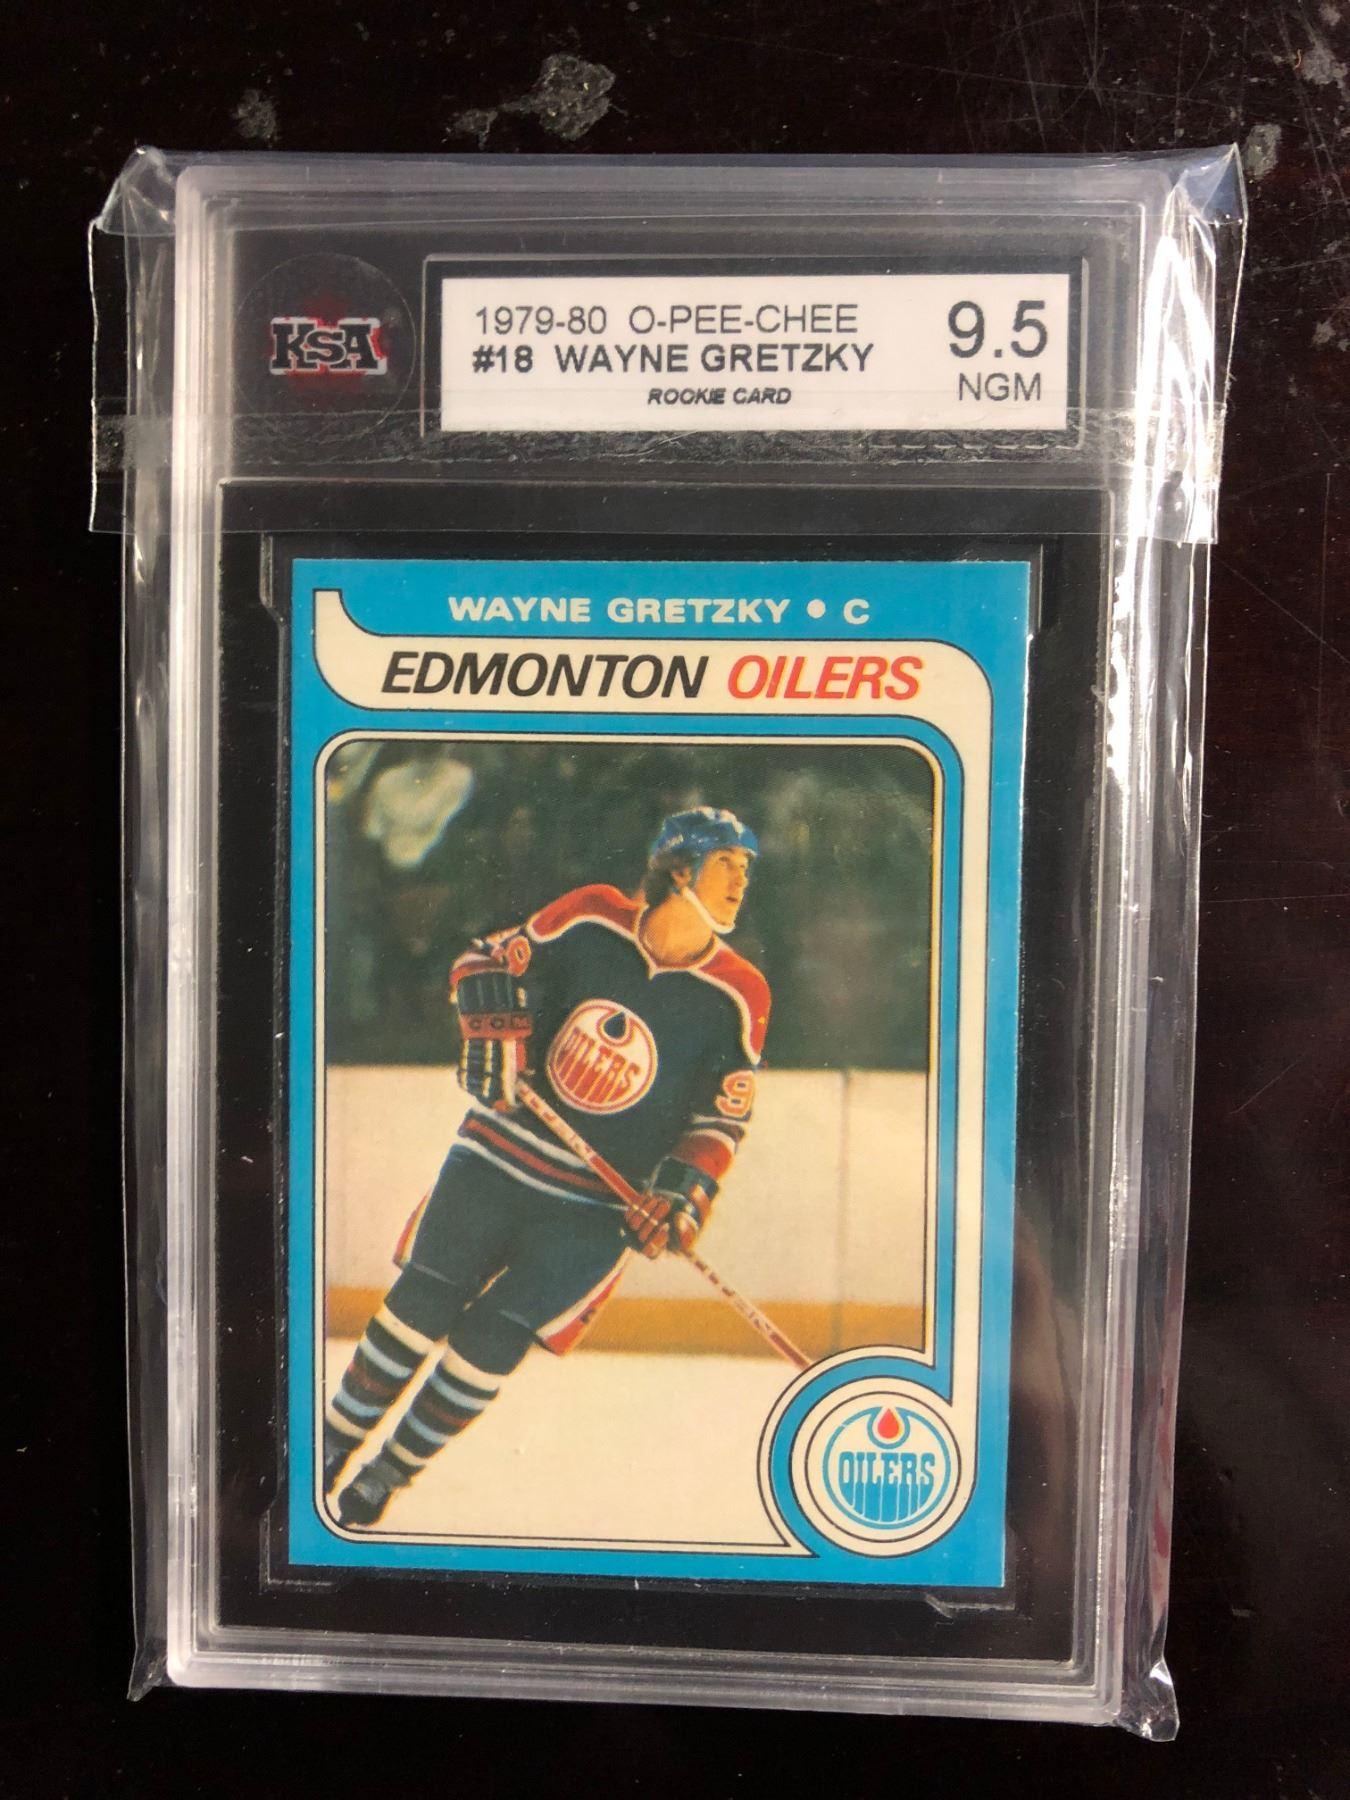 1979 80 O Pee Chee 18 Wayne Gretzky Rookie Card 95 Ngm Ksa Graded